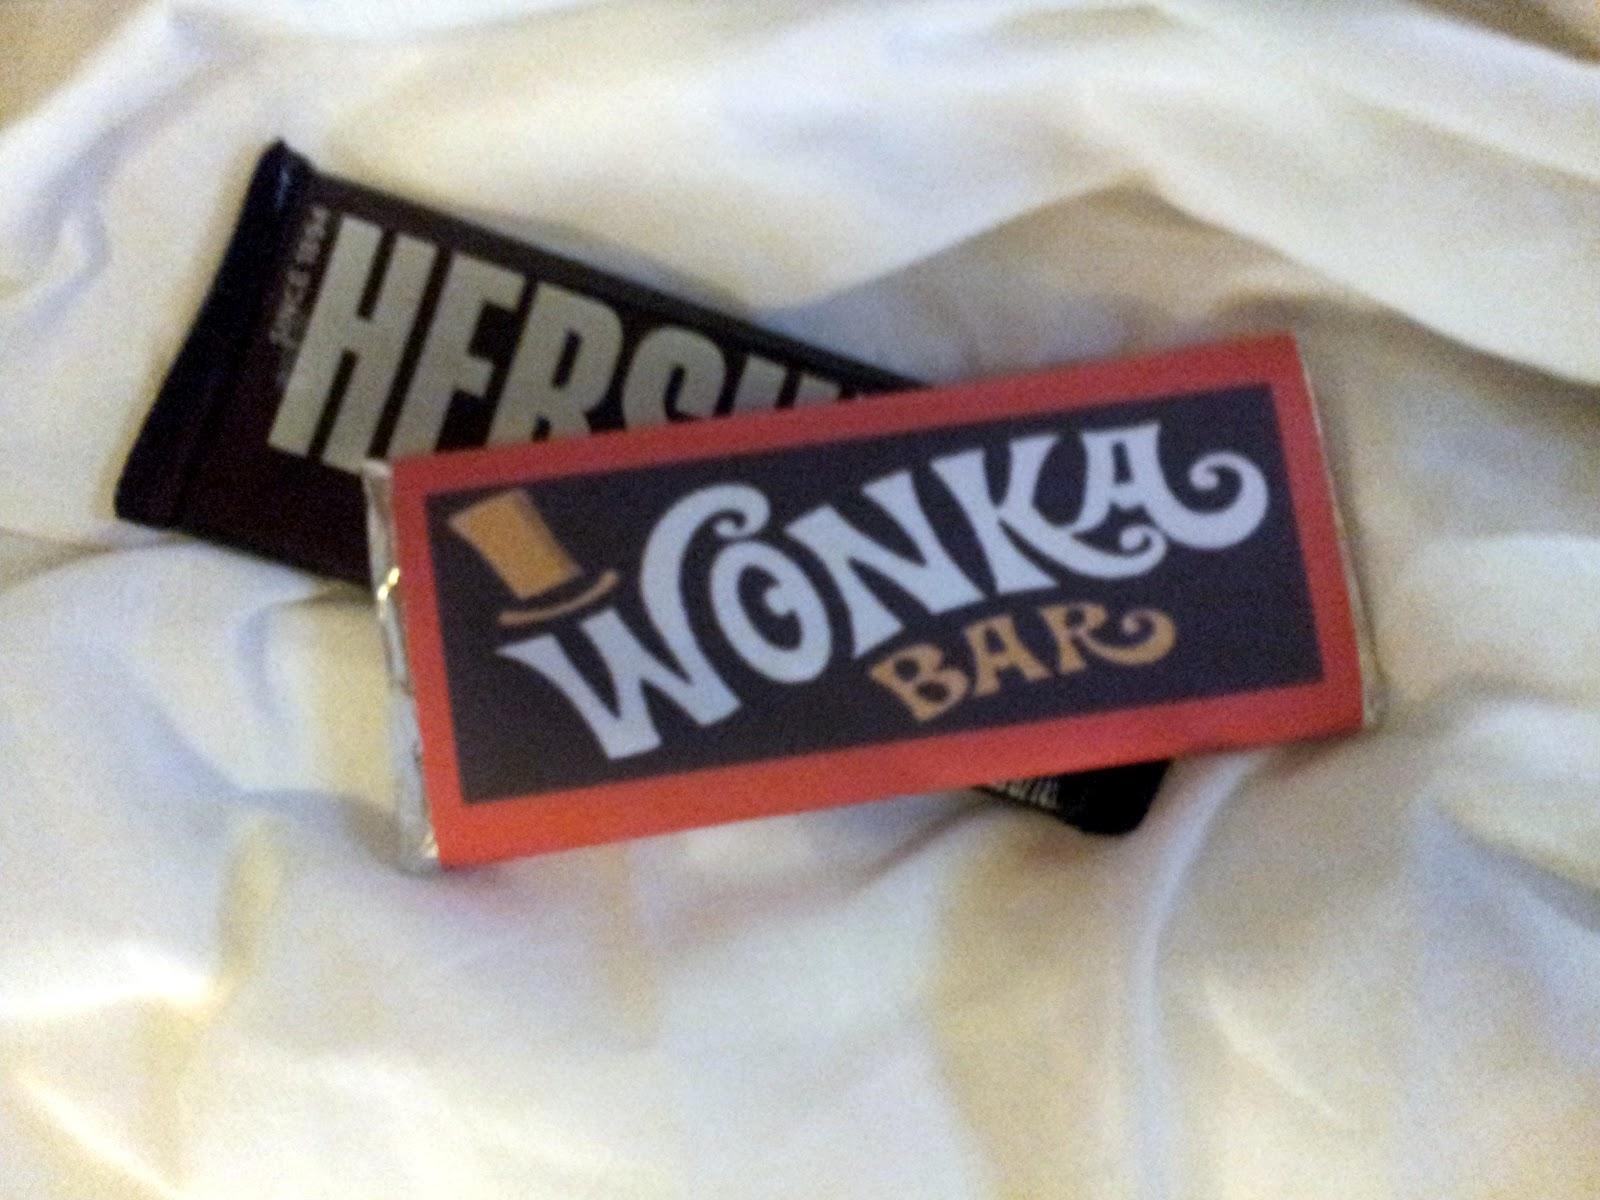 Wonka Bar Wrapper Templates Just B Cause